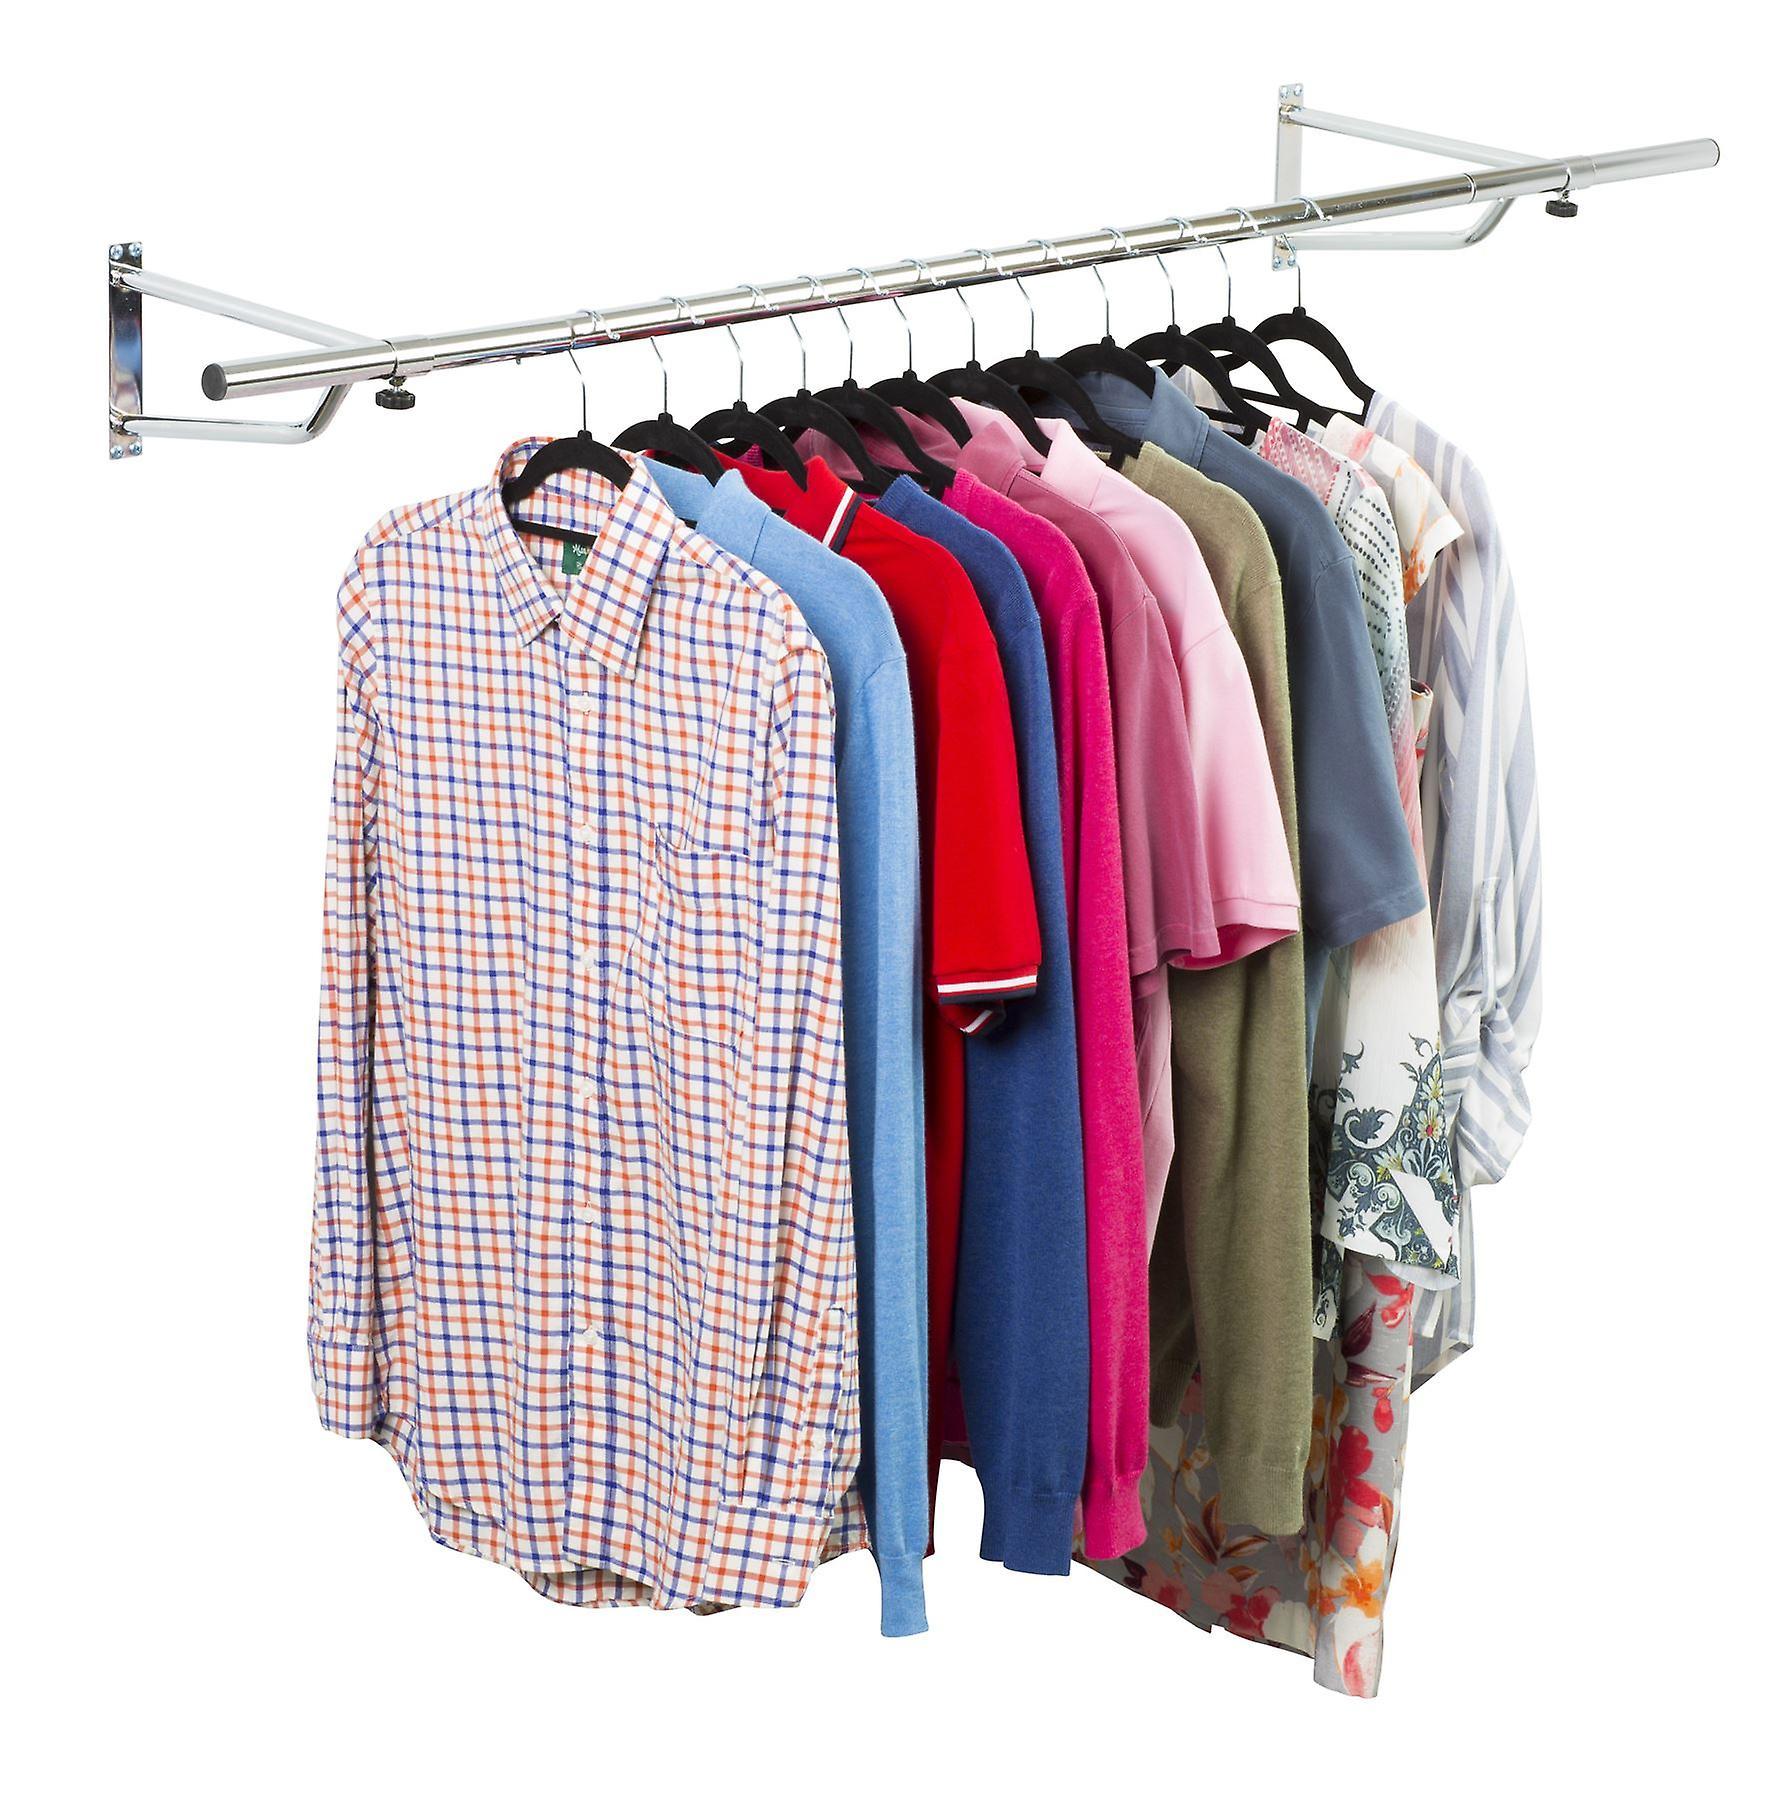 5ft Garment Rail In Chrome Plated